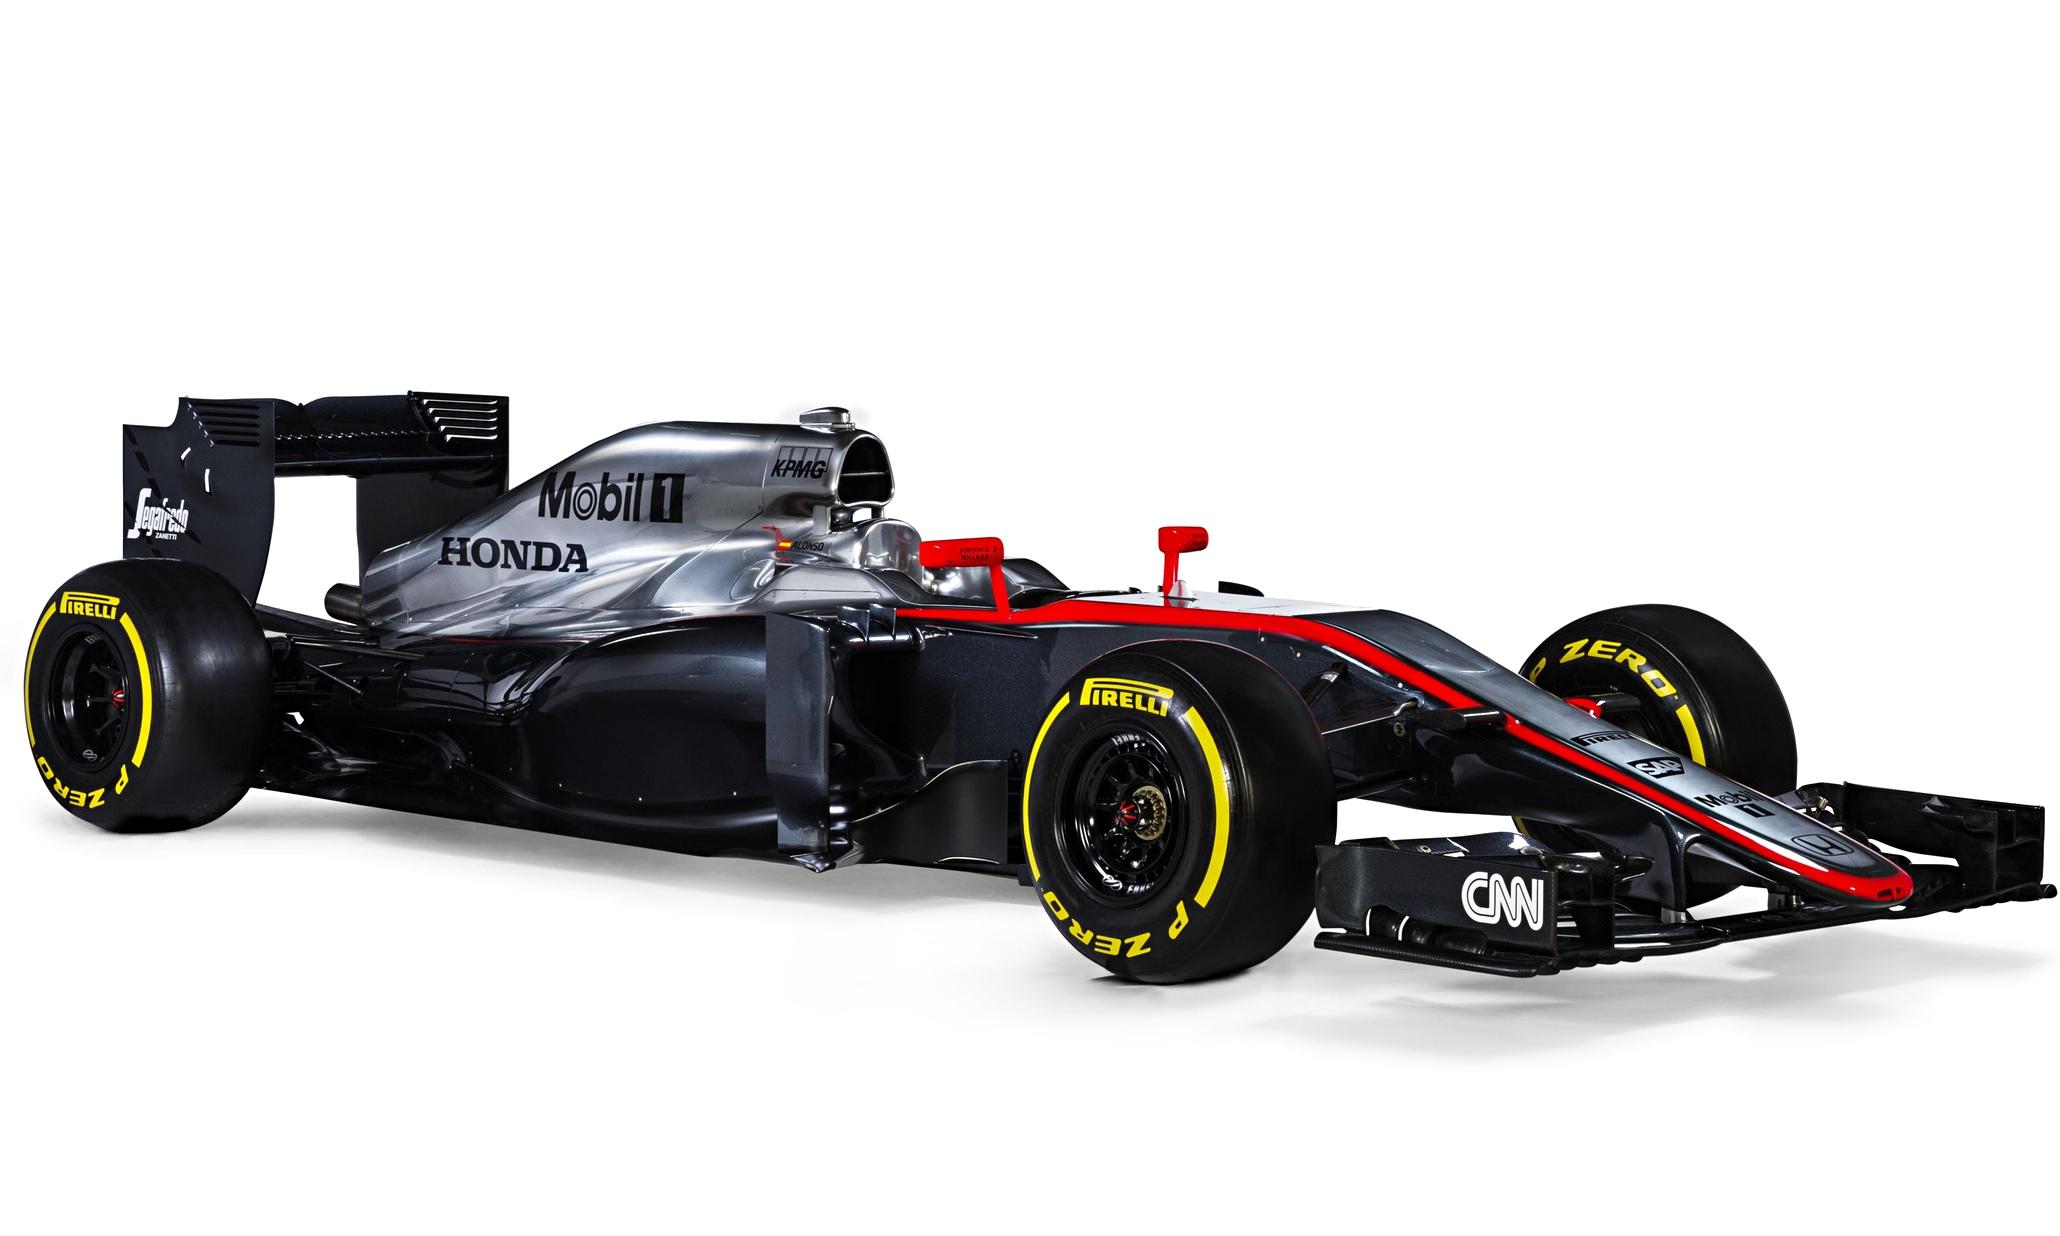 mclaren honda unveil car for 2015 f1 world championship. Black Bedroom Furniture Sets. Home Design Ideas